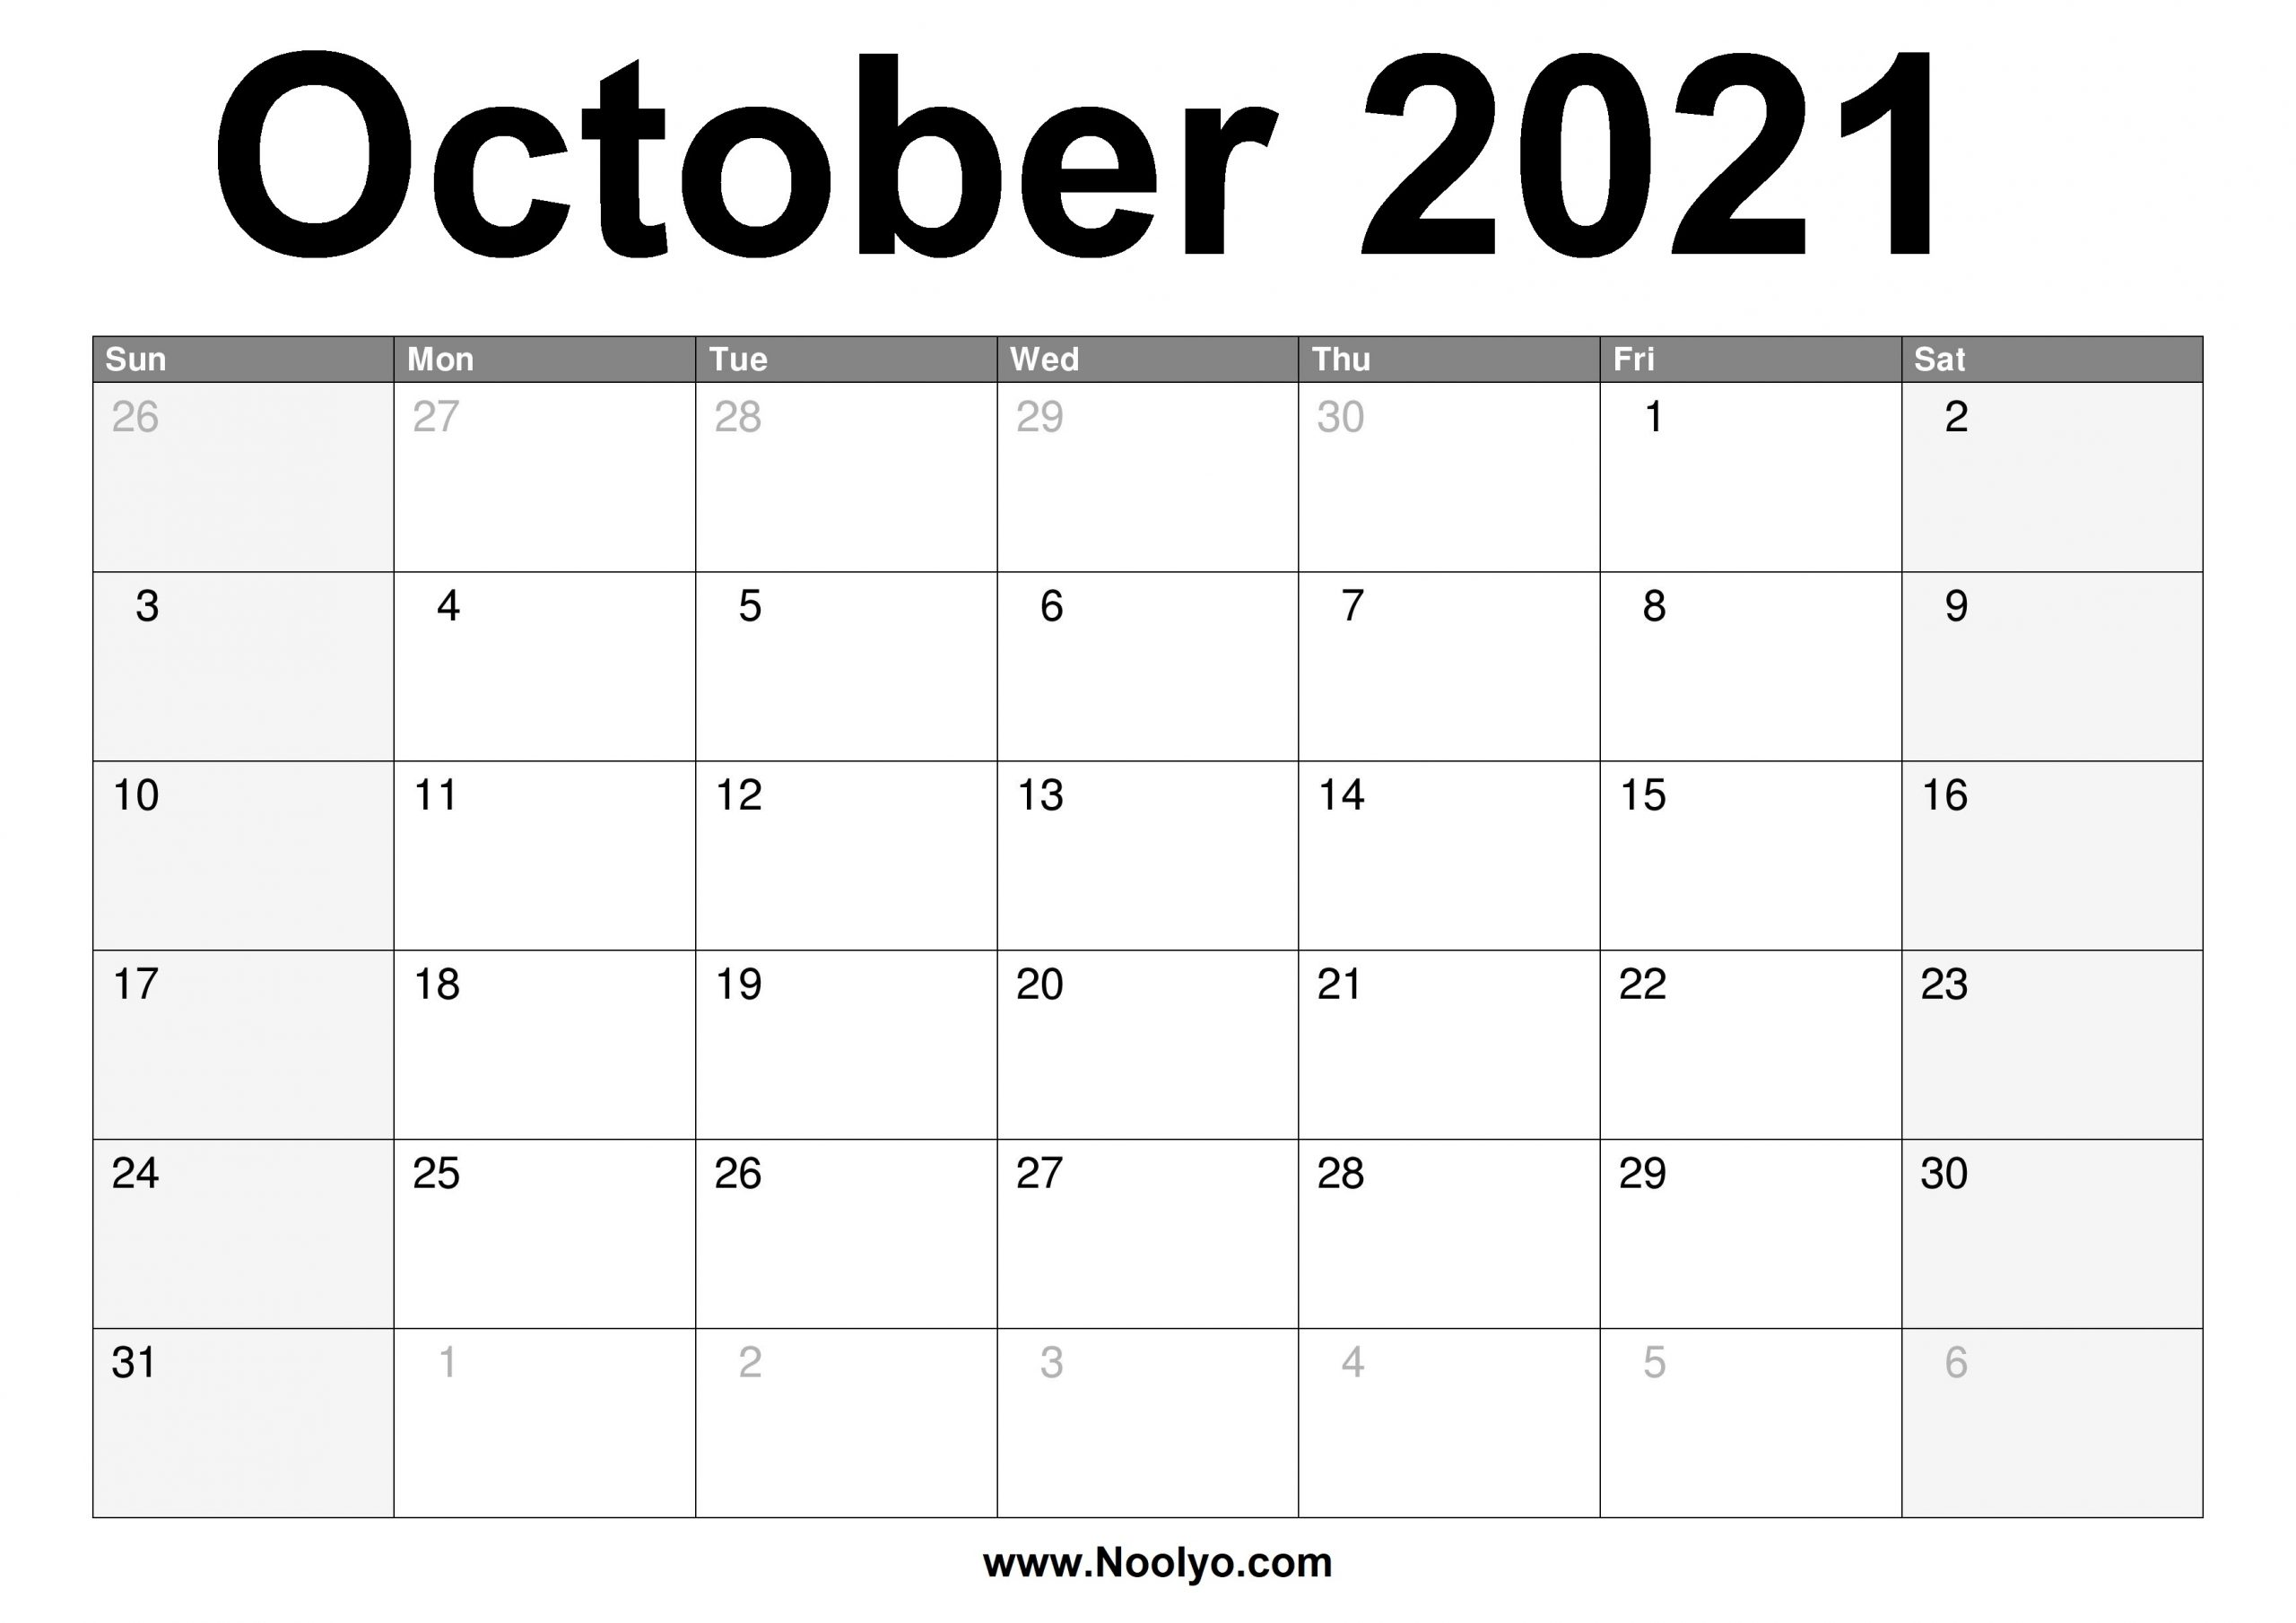 October 2021 Calendar Printable - Free Download - Noolyo